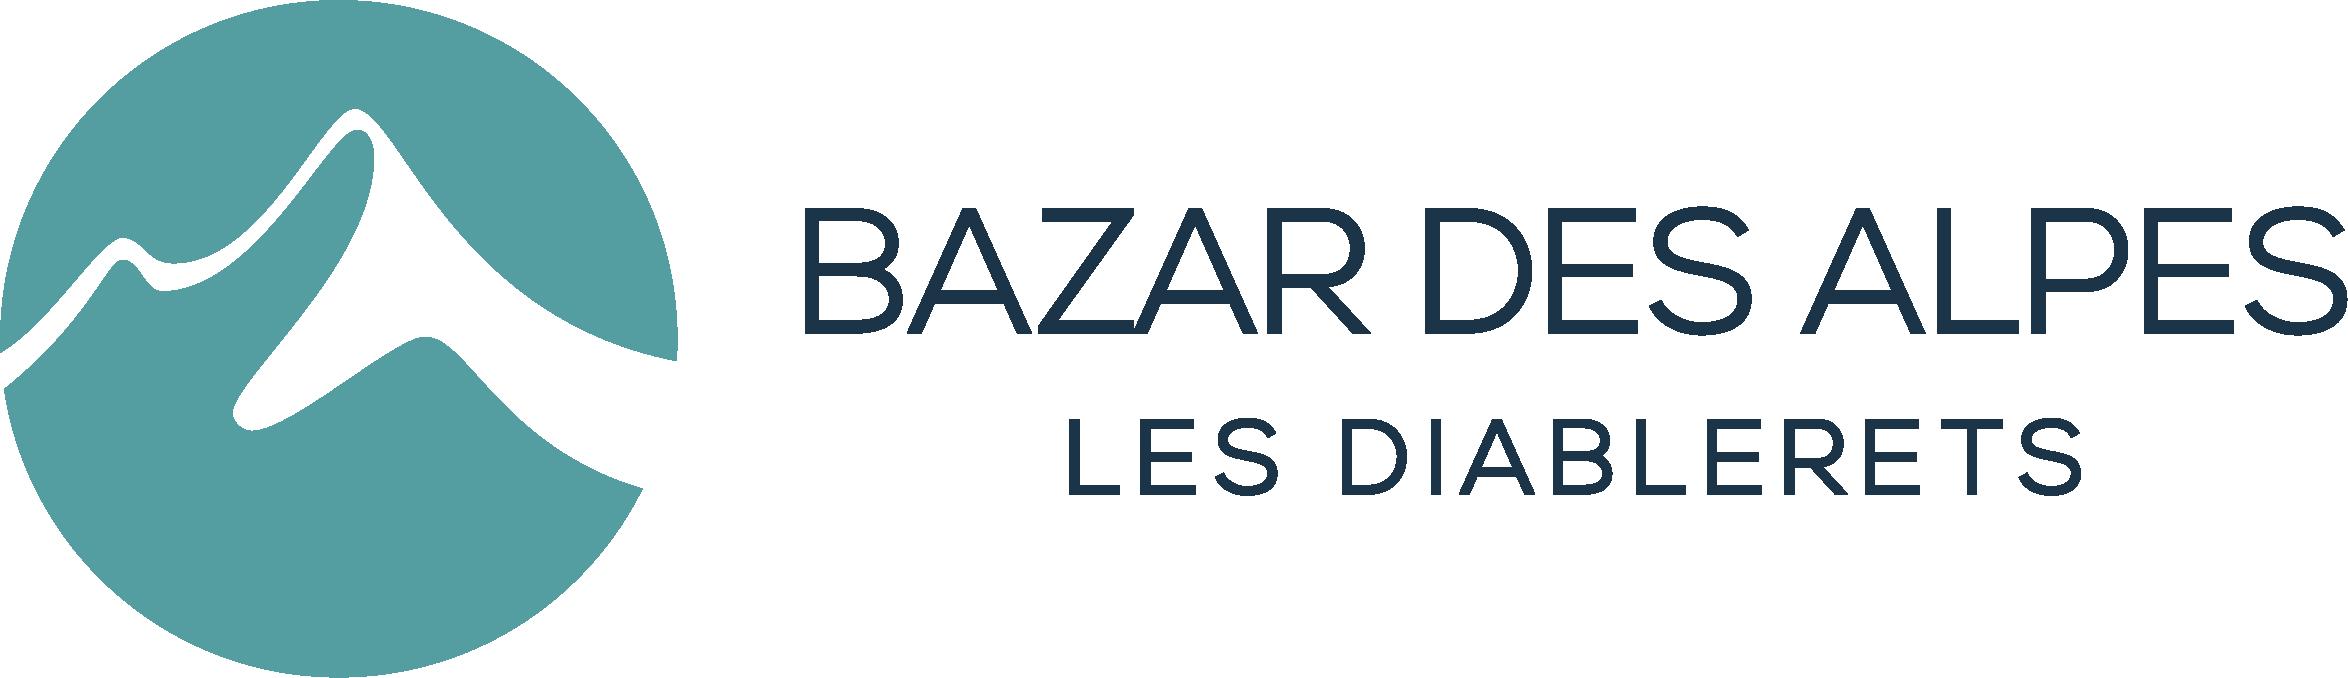 Bazar des Alpes